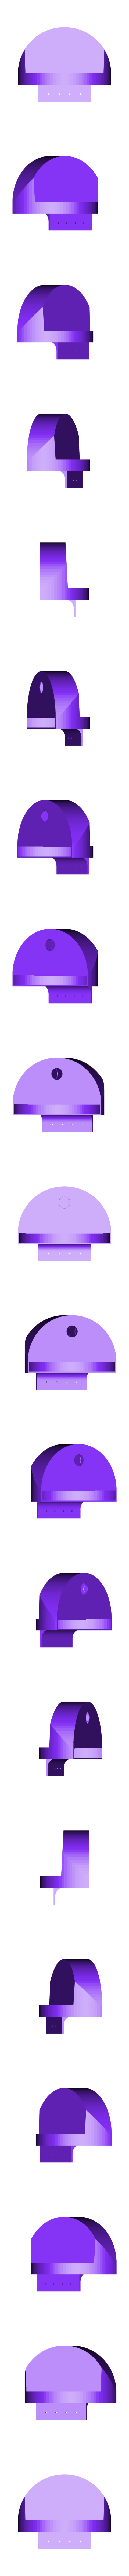 tank.stl Download free STL file The Bicycle Bubble Machine • 3D print design, Istareyn